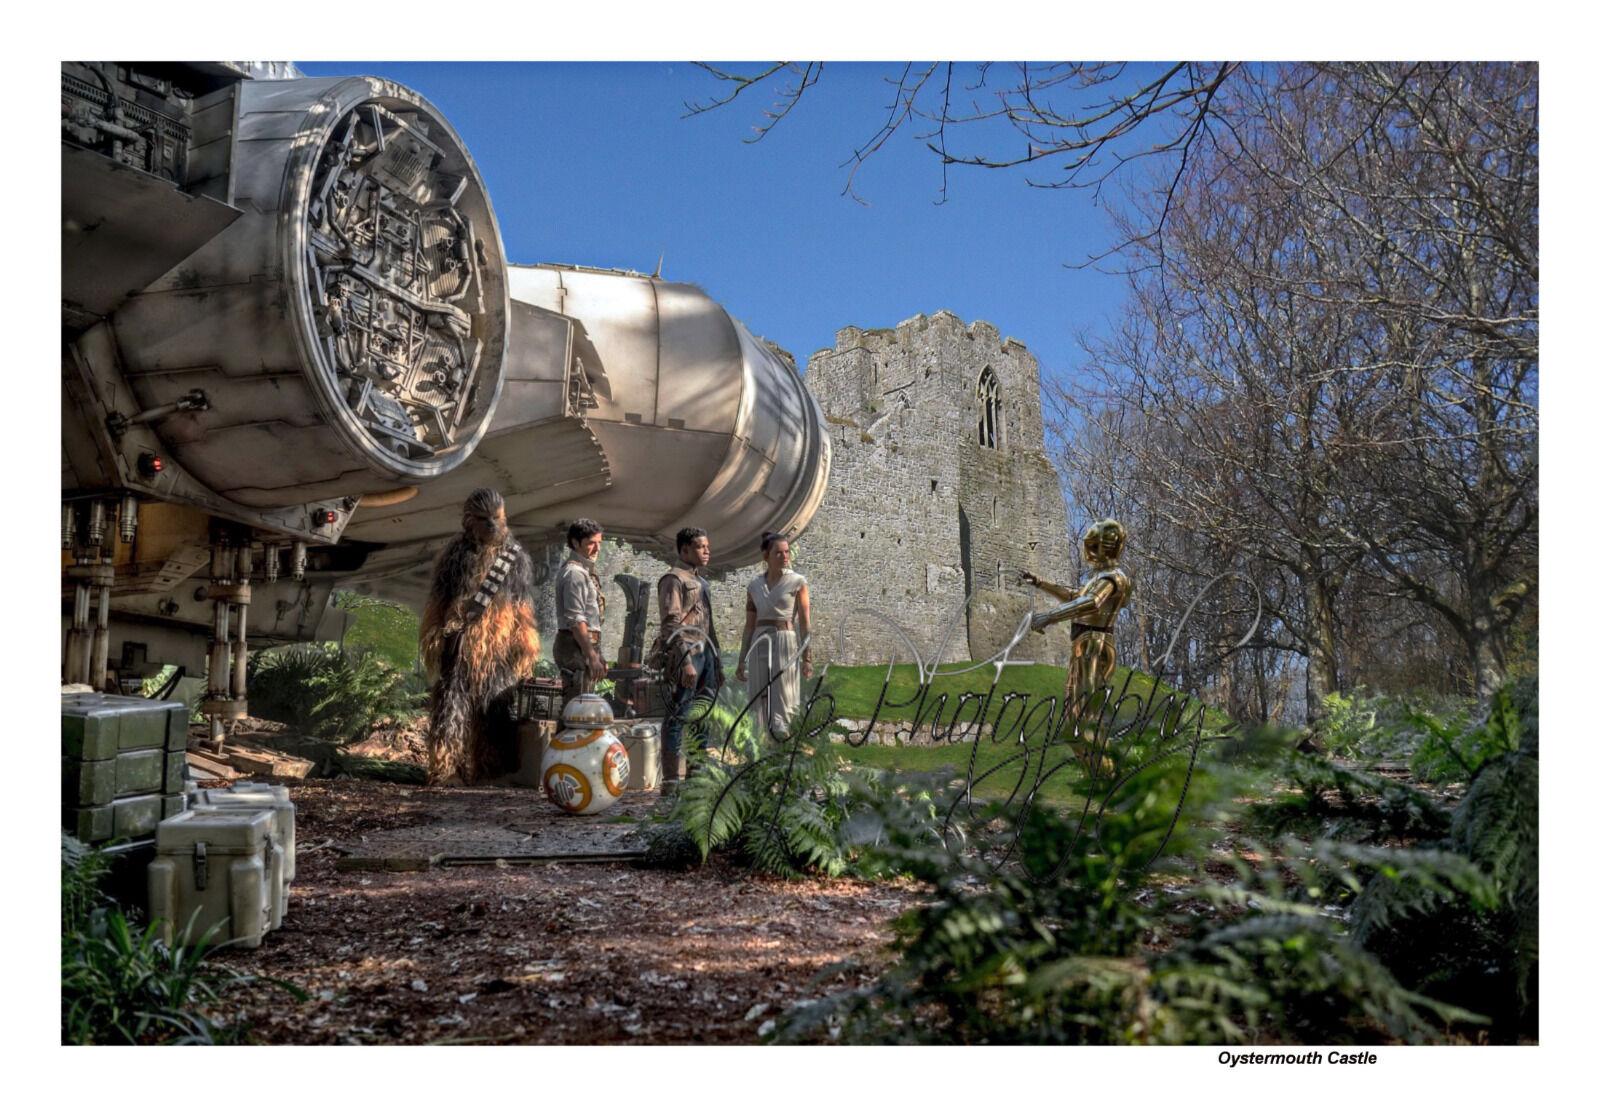 Millennium Falcon @ OysterMouth Castle